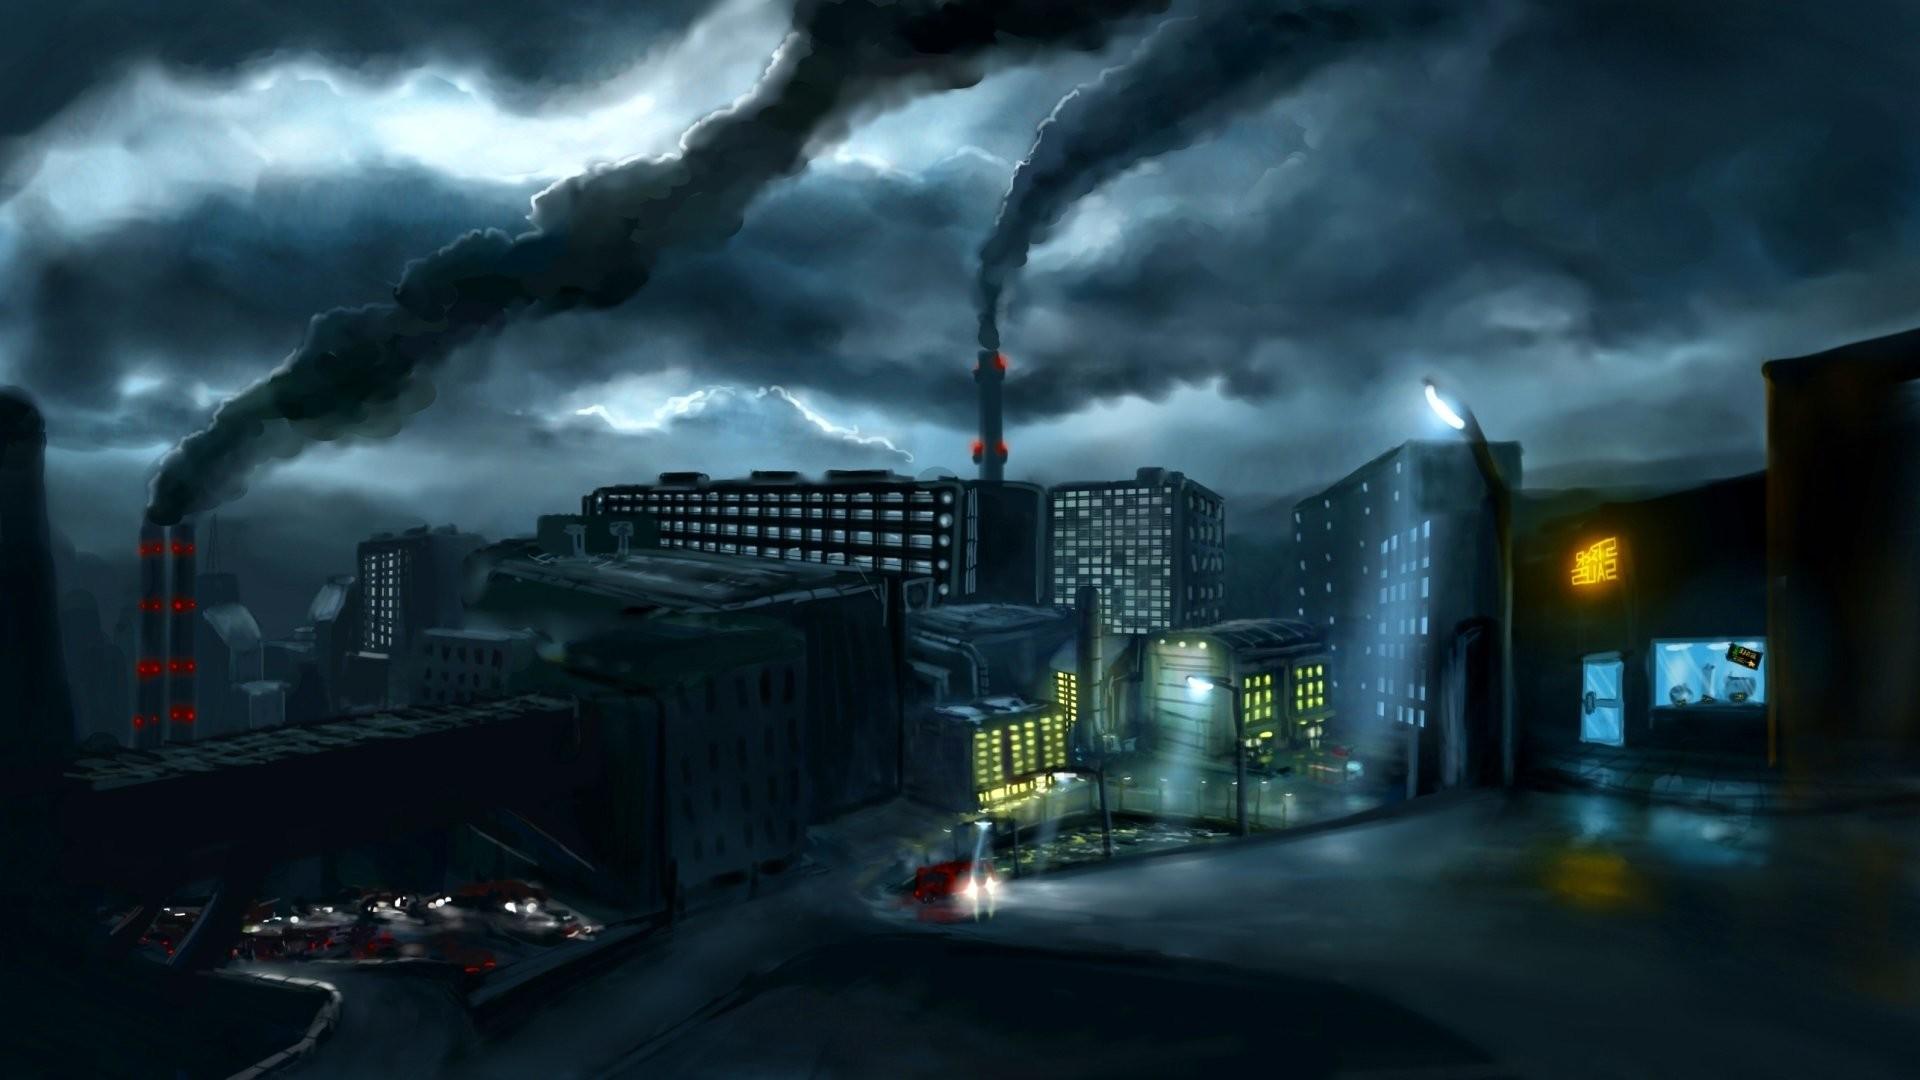 Dark Art Artwork Fantasy Artistic Original Horror Evil Creepy Scary Spooky  Halloween Wallpaper At Dark Wallpapers